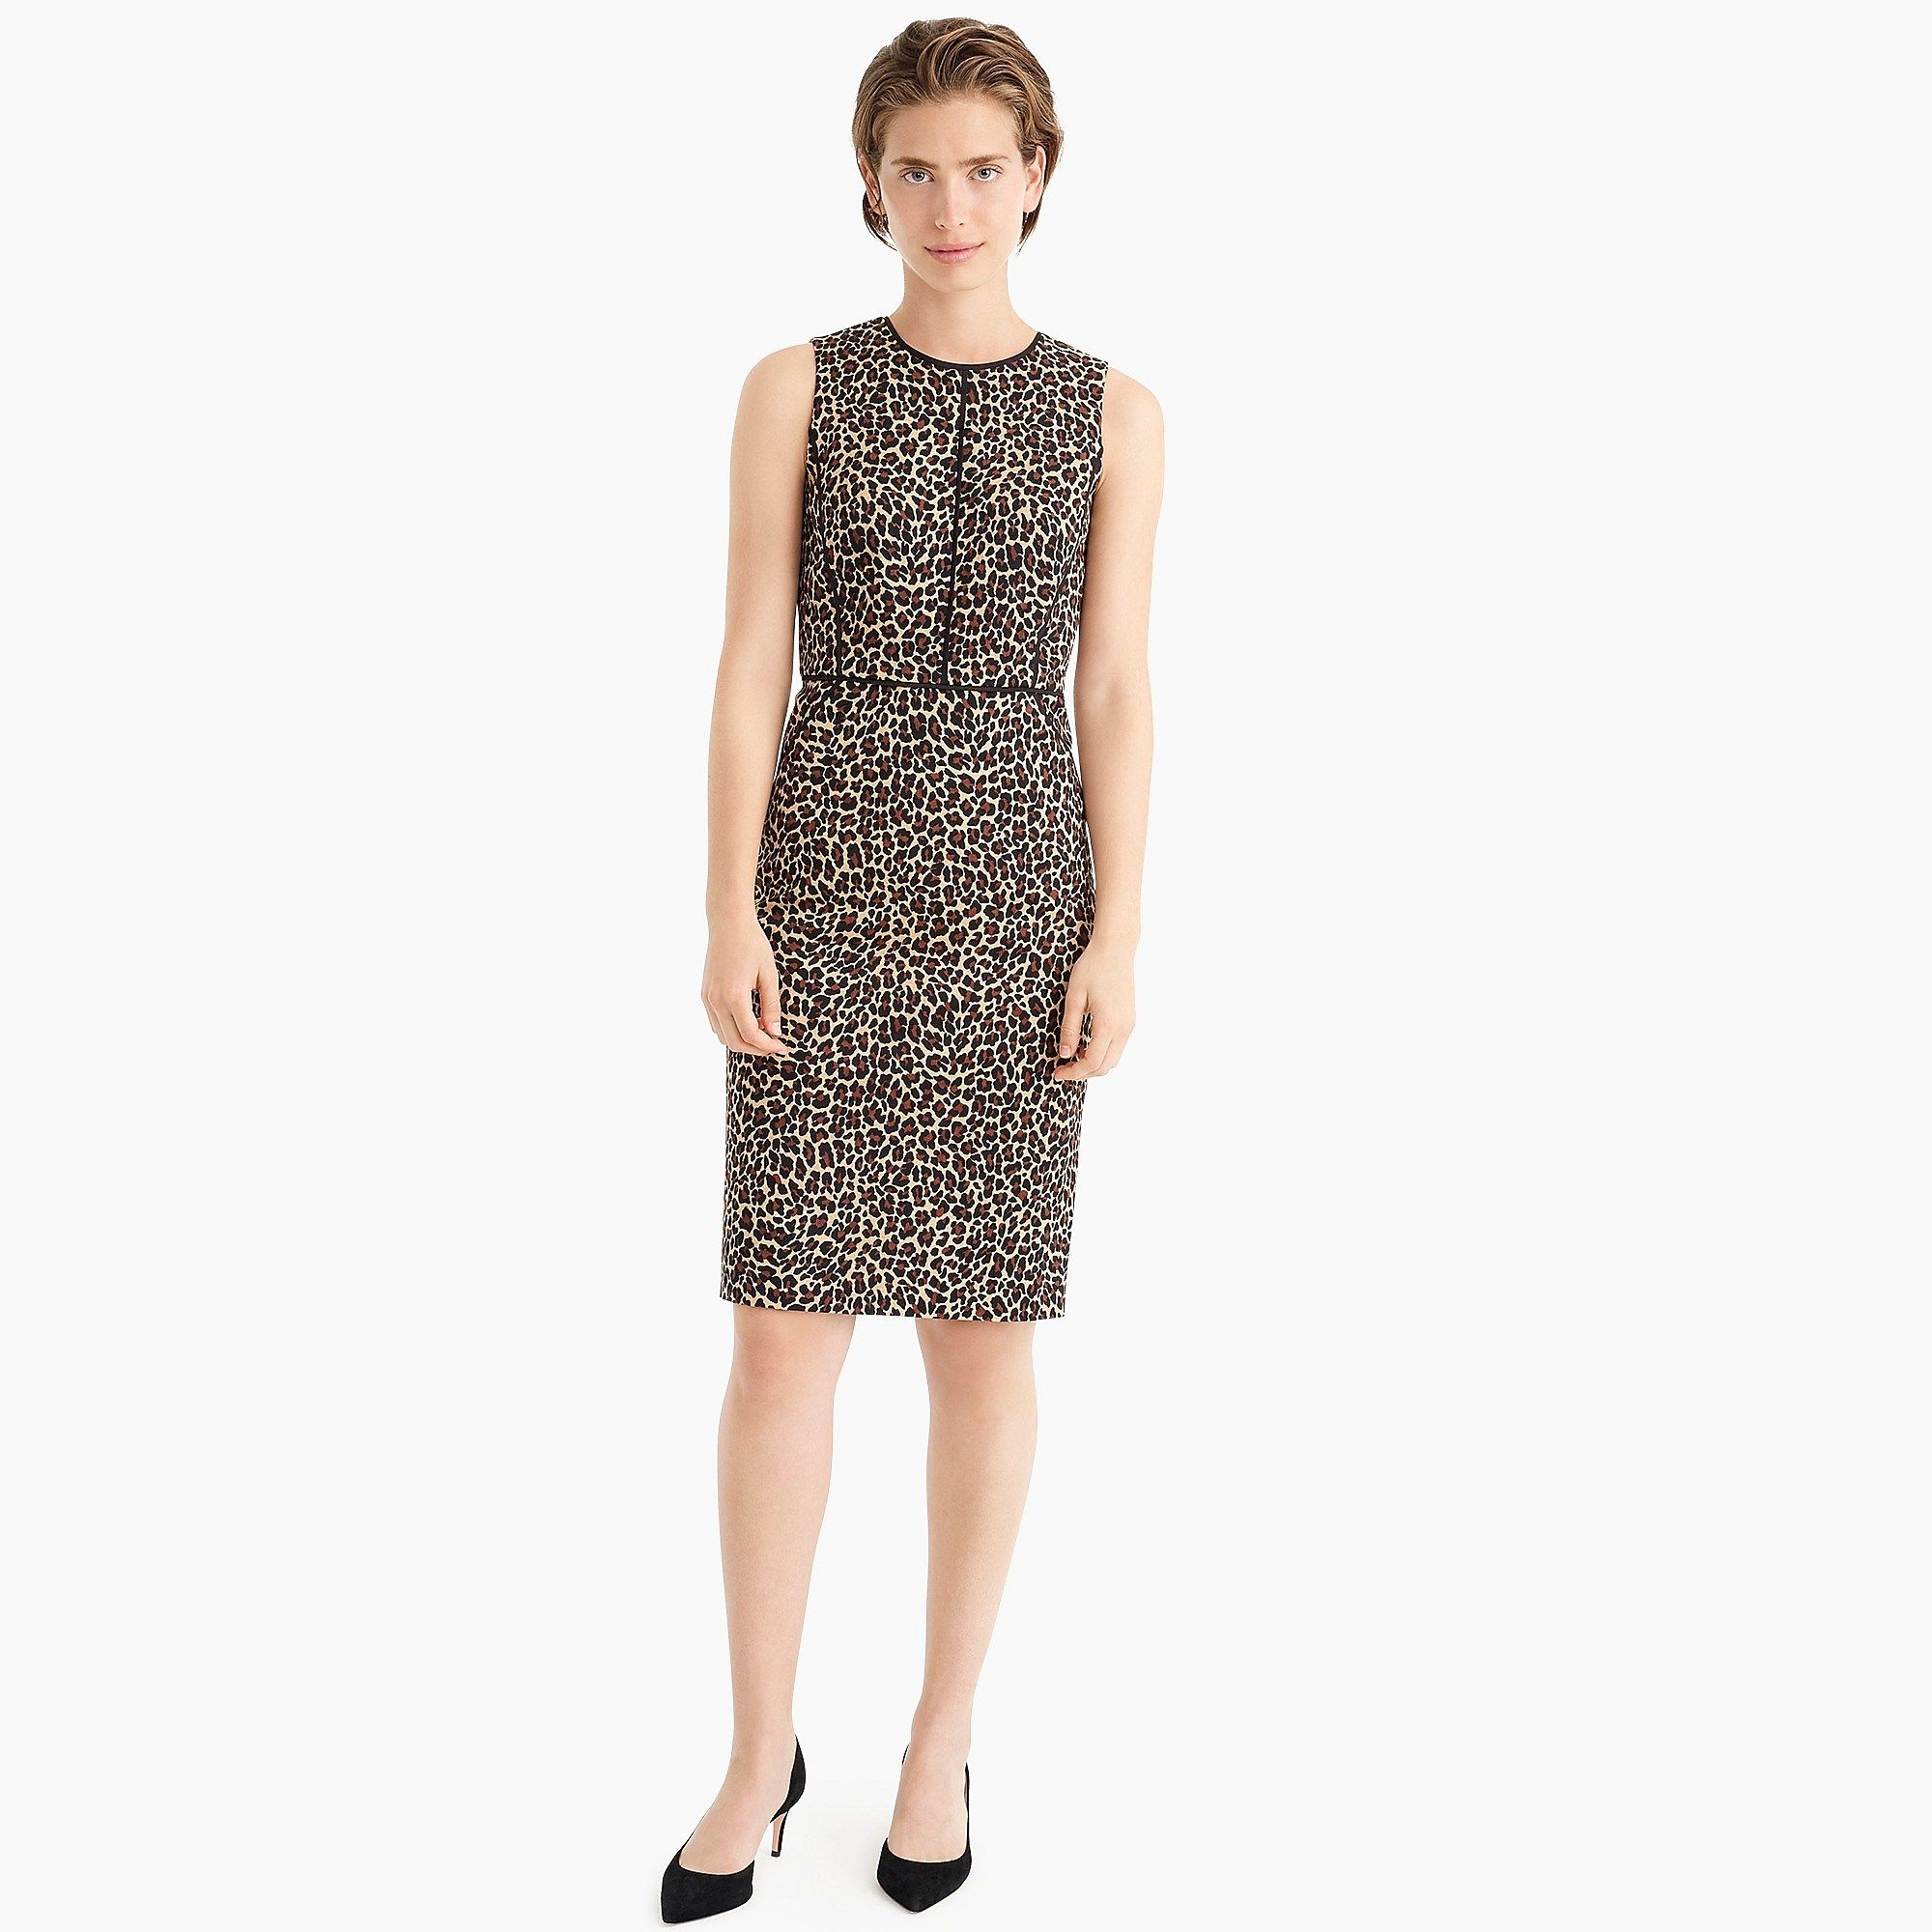 7e15d796 J. Crew Sheath dress in leopard print - Leopard   MY CLOSET ...